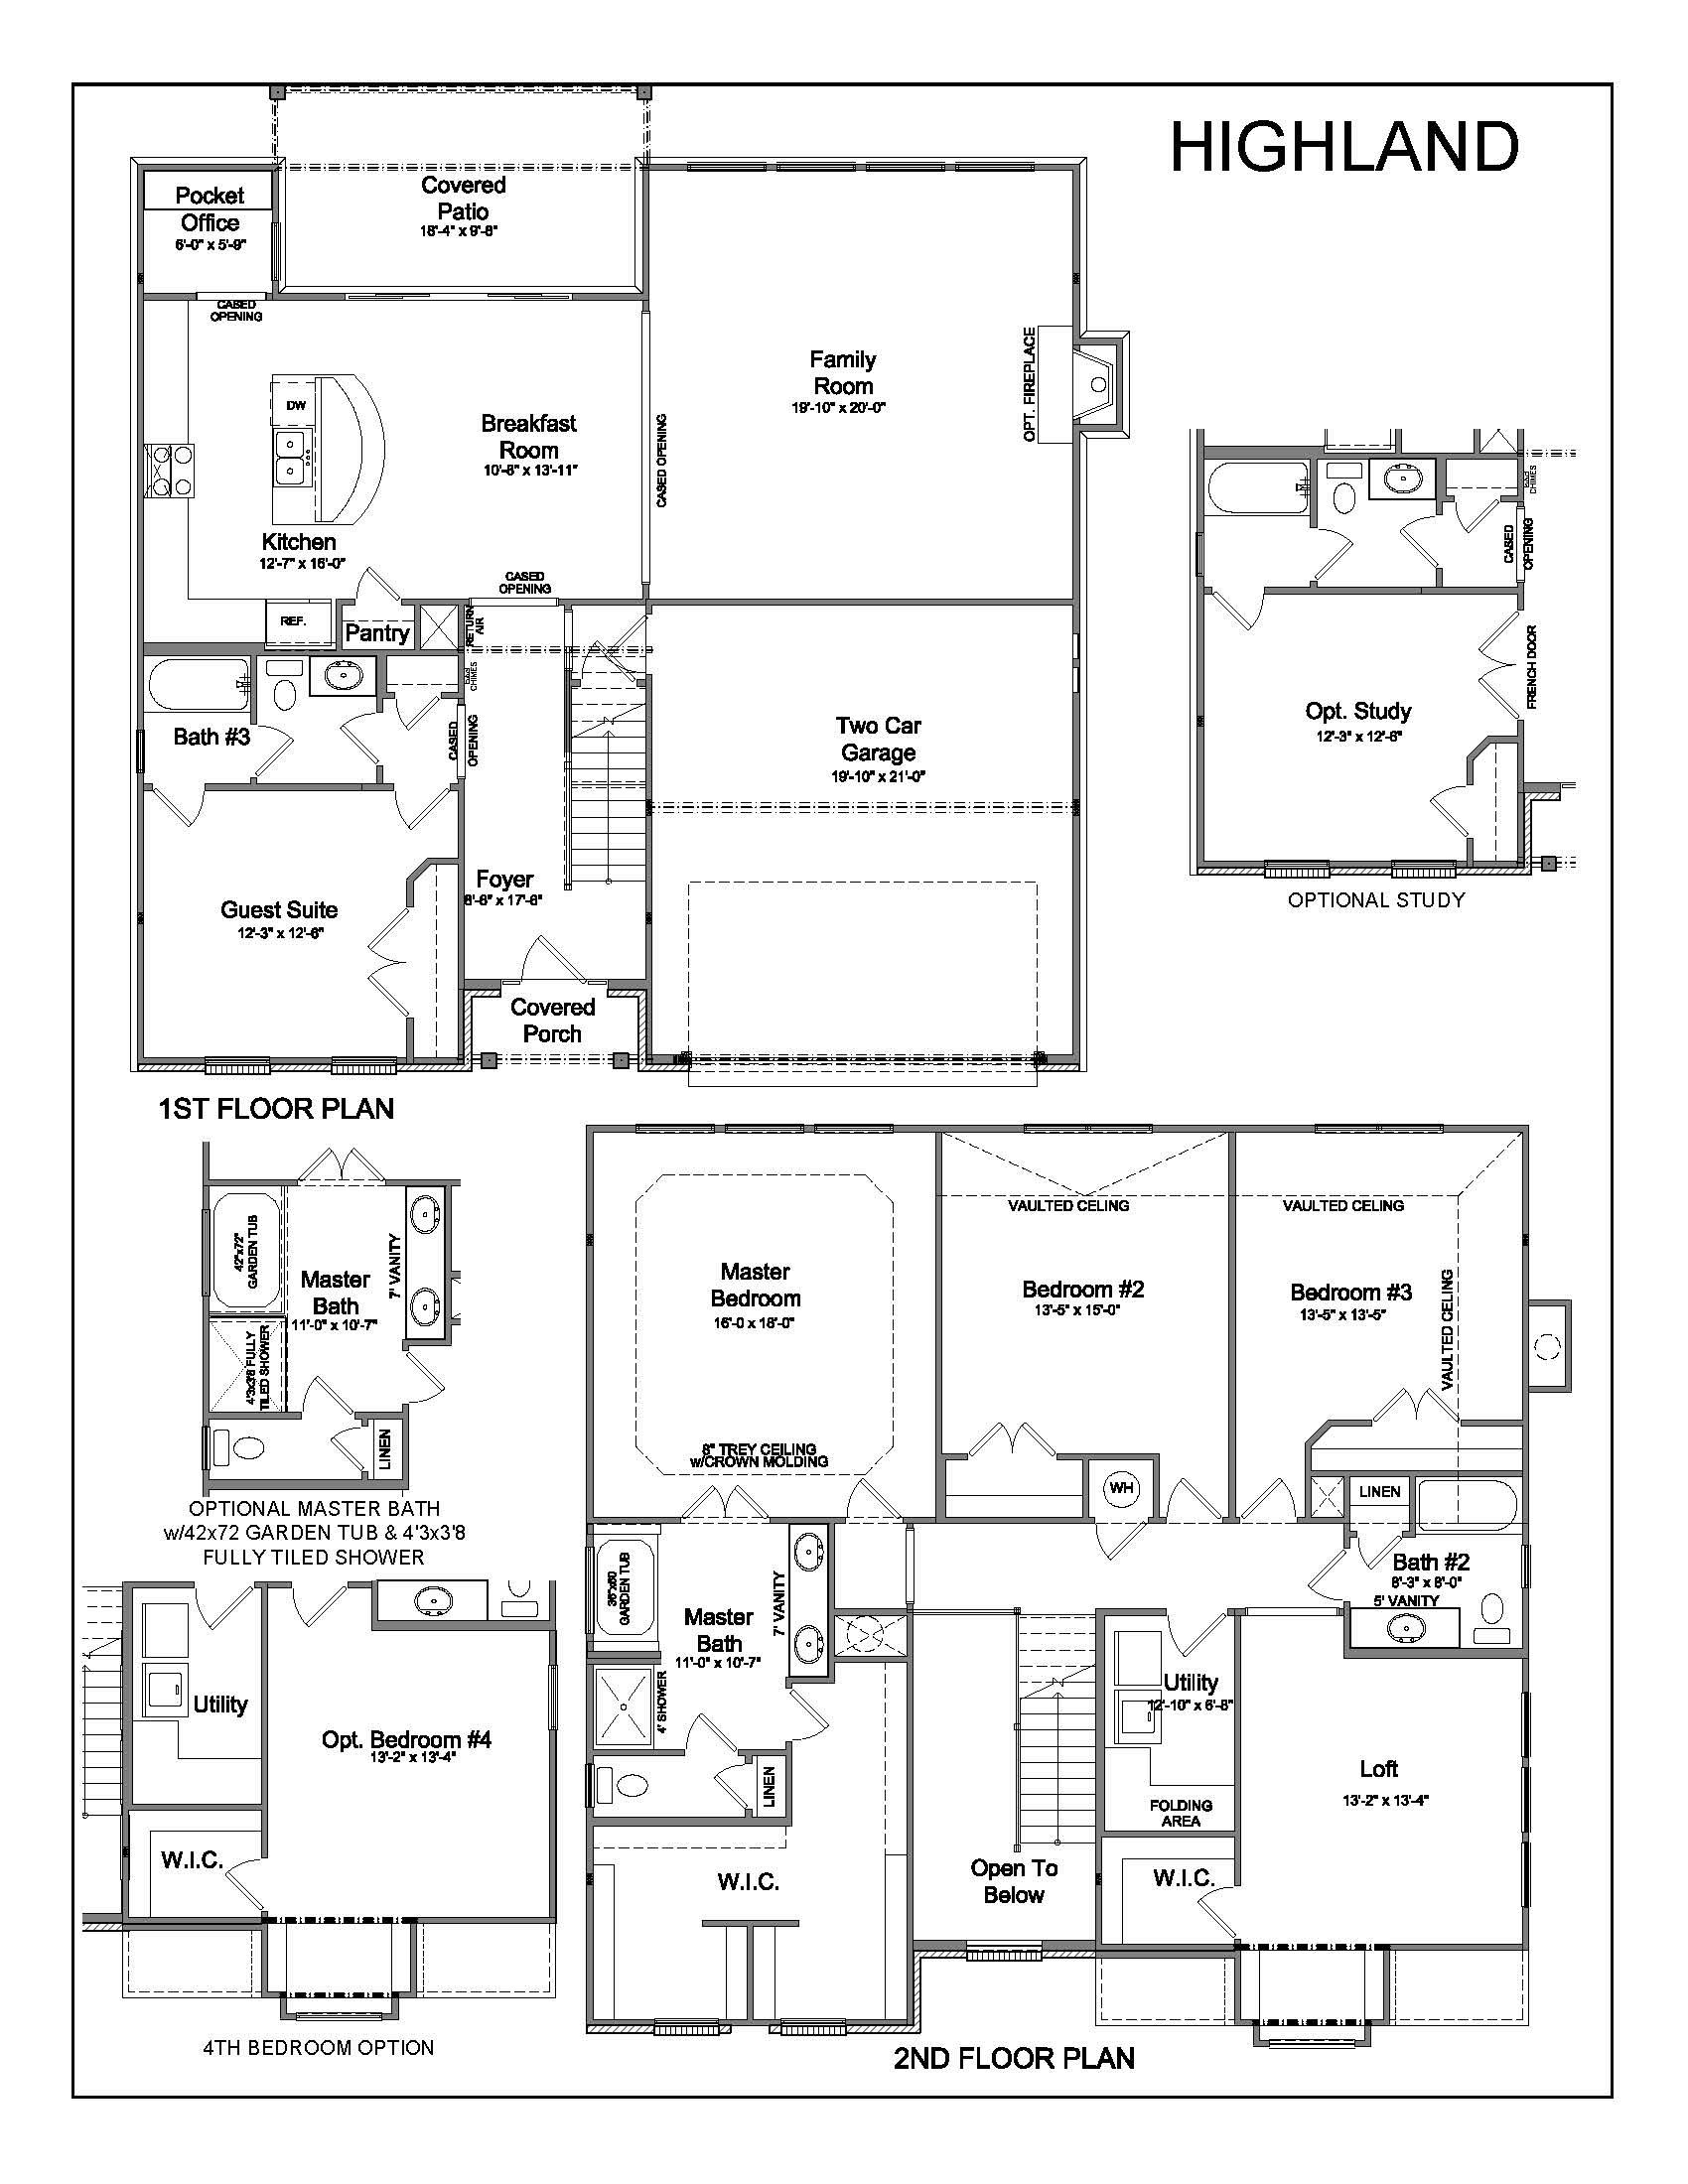 Highland Homes Floor Plan 926